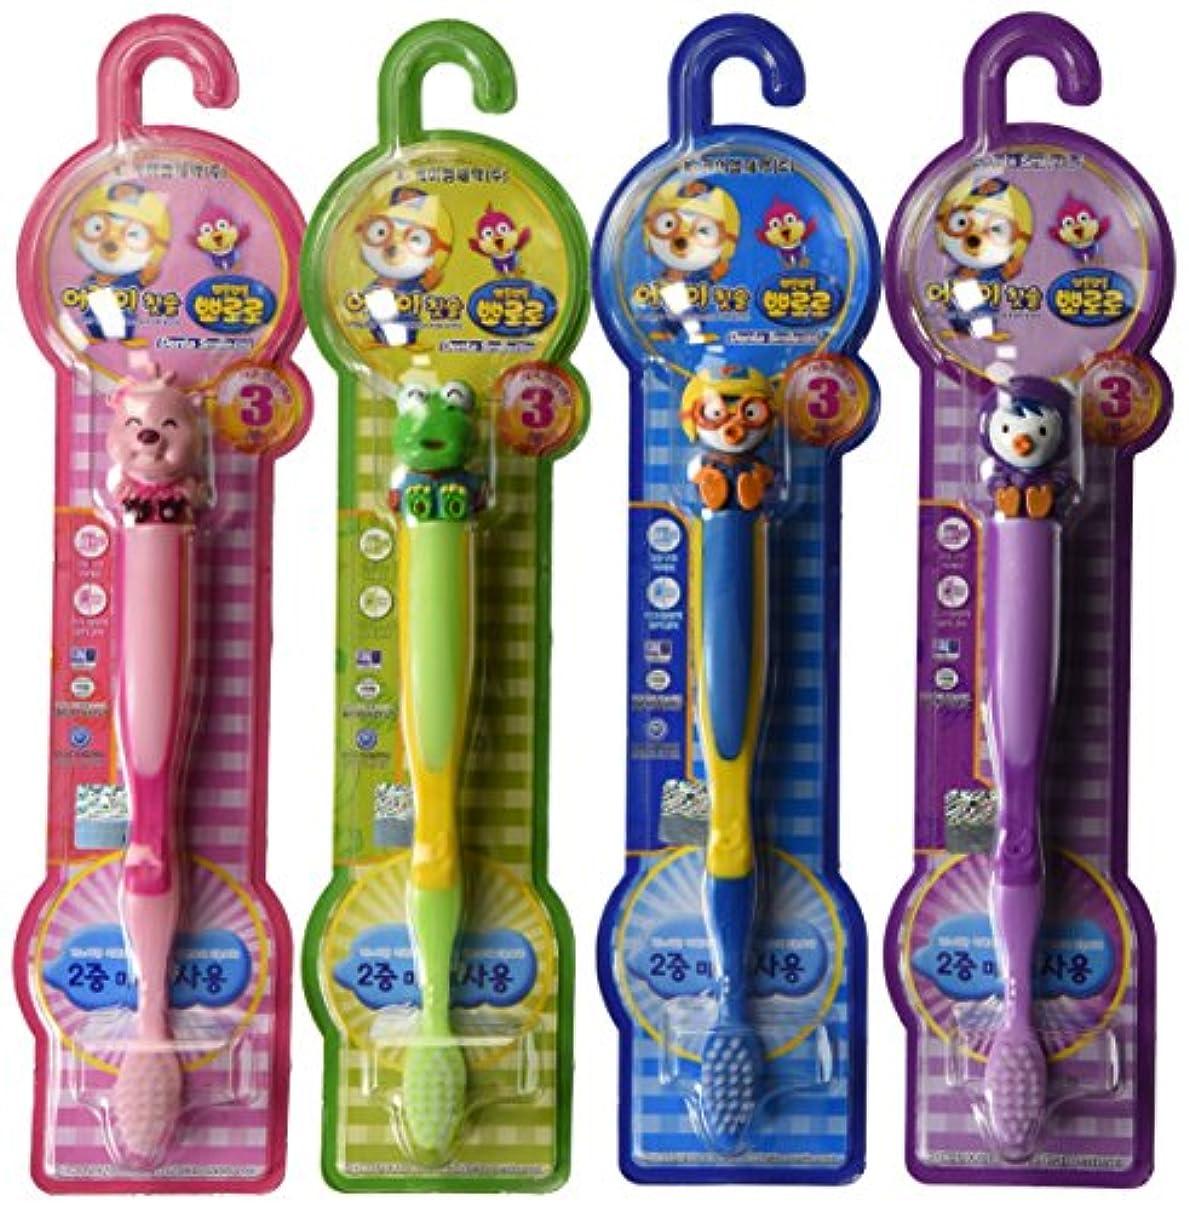 Pororo Kids Children Toothbrush Toothpaste (4units) by TheJD [並行輸入品]